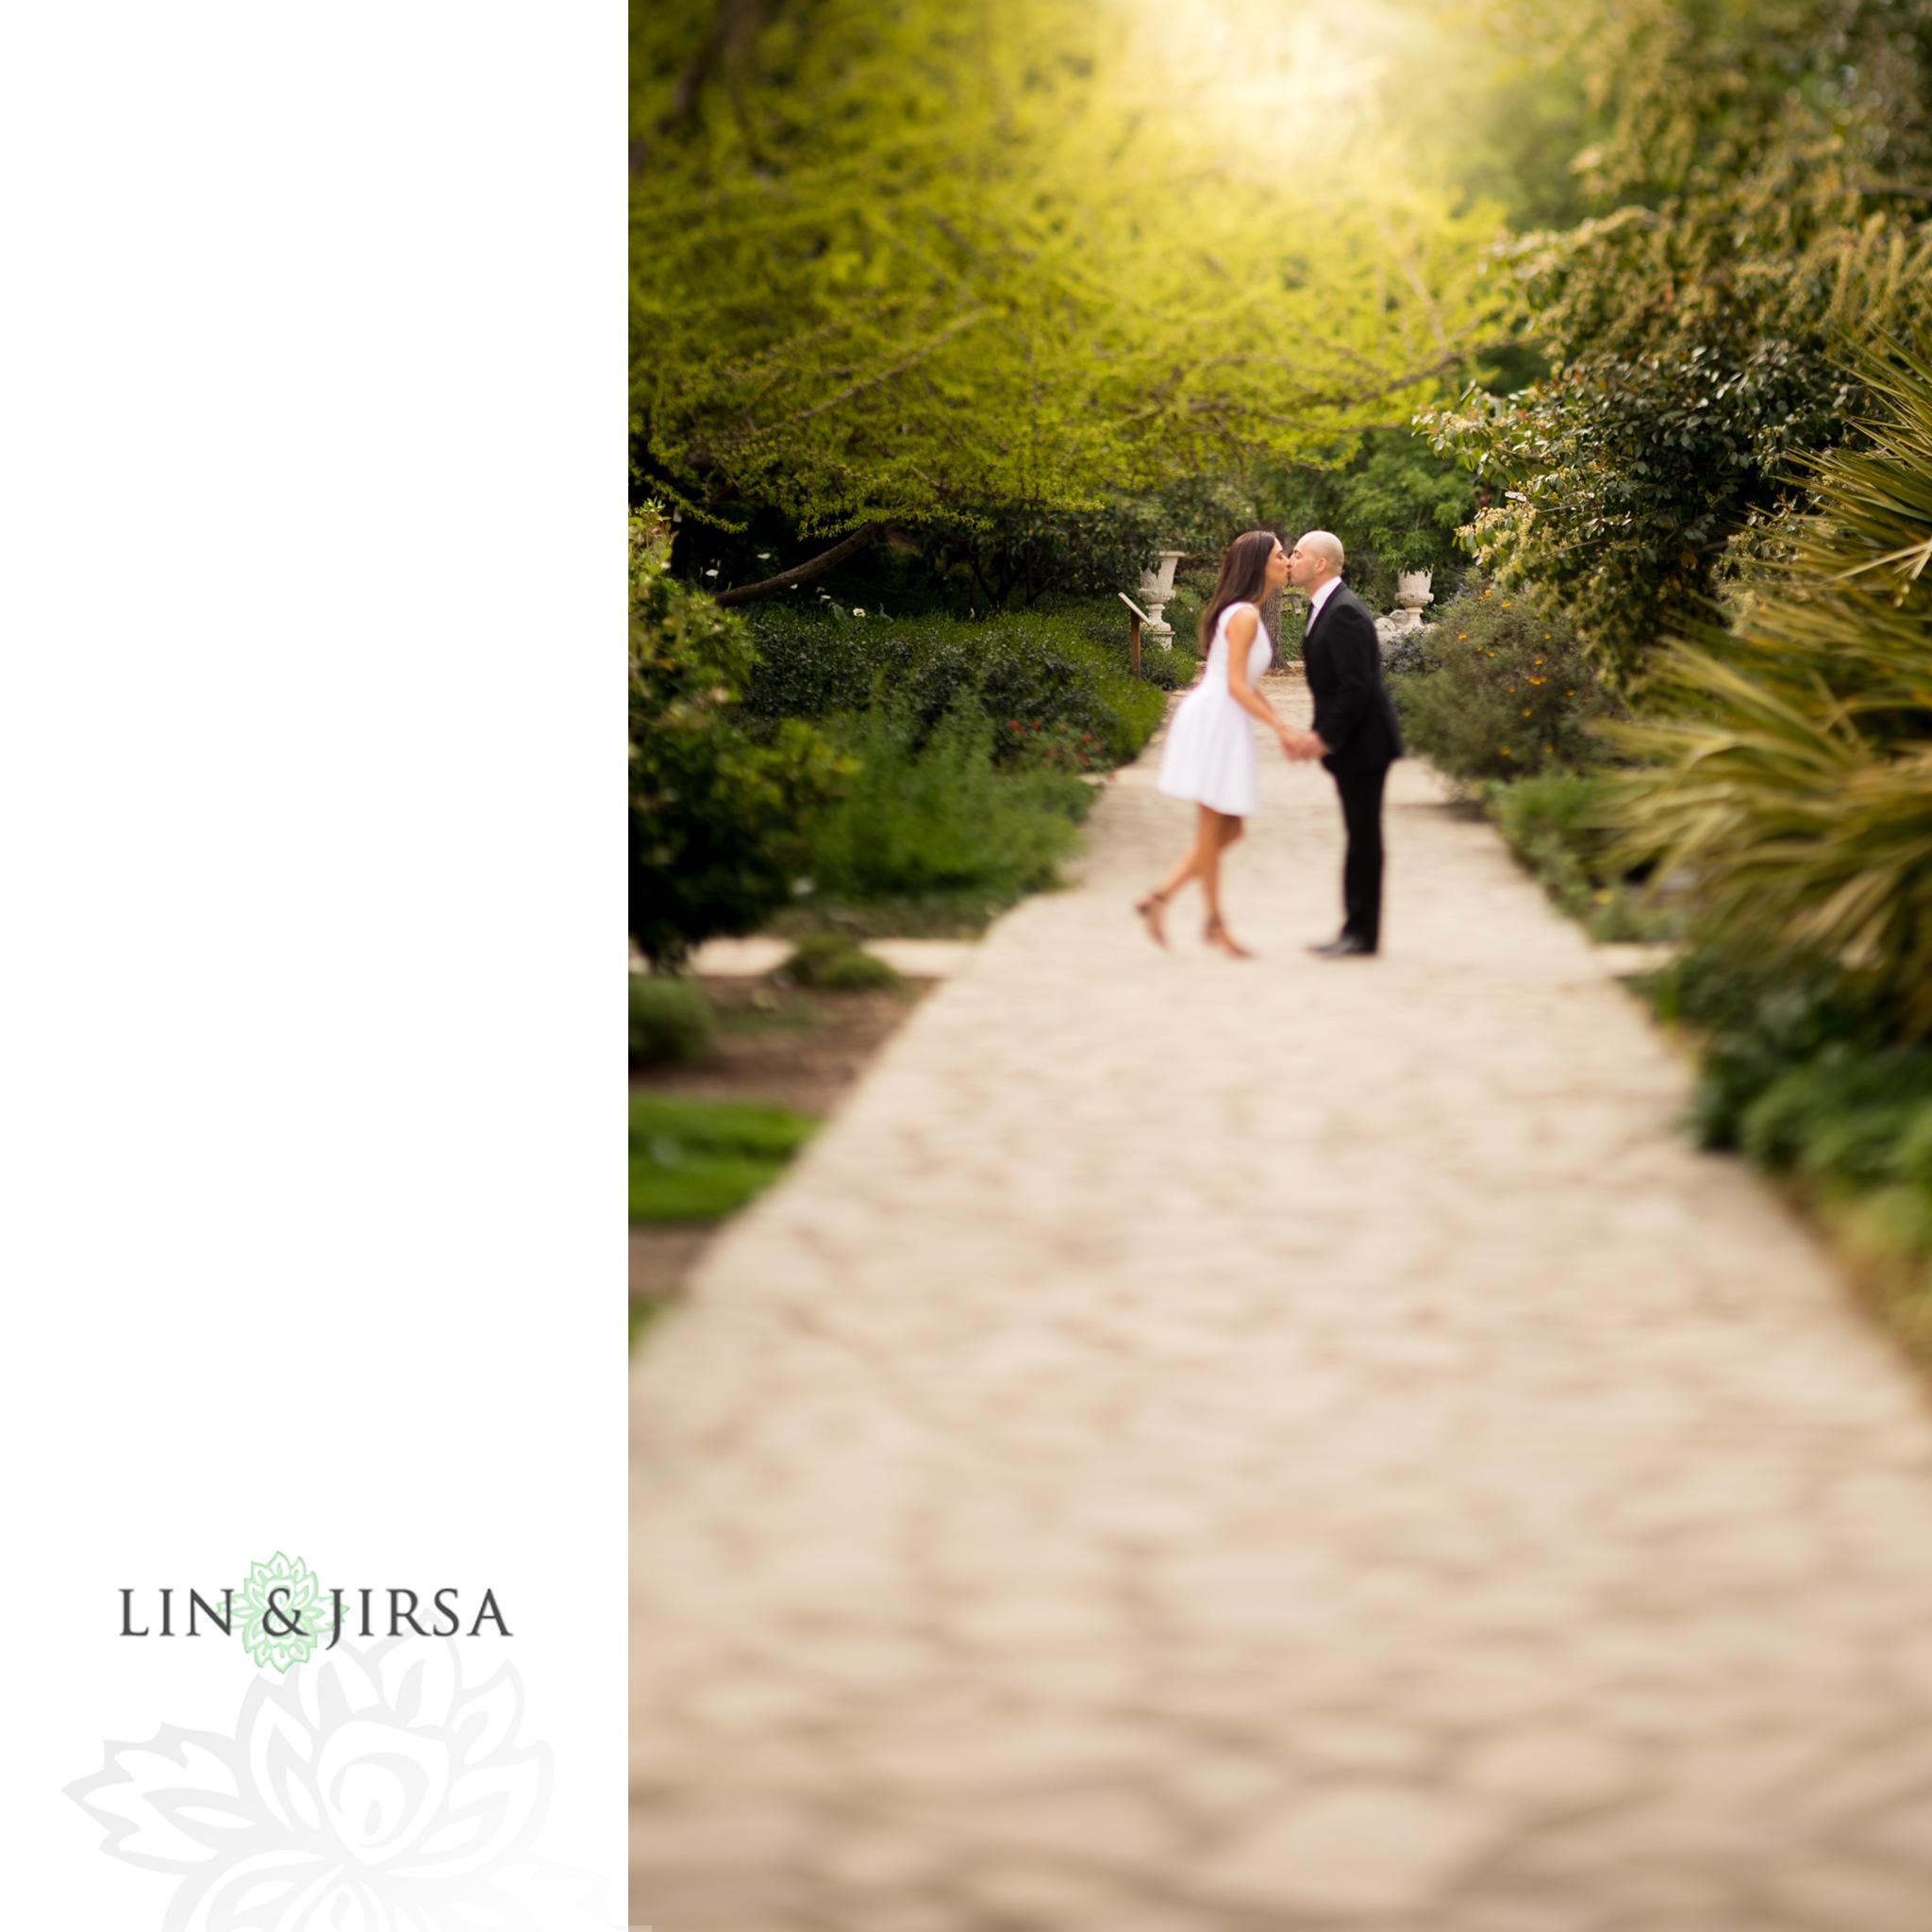 06-Los-angeles-arboretum-engagement-photography